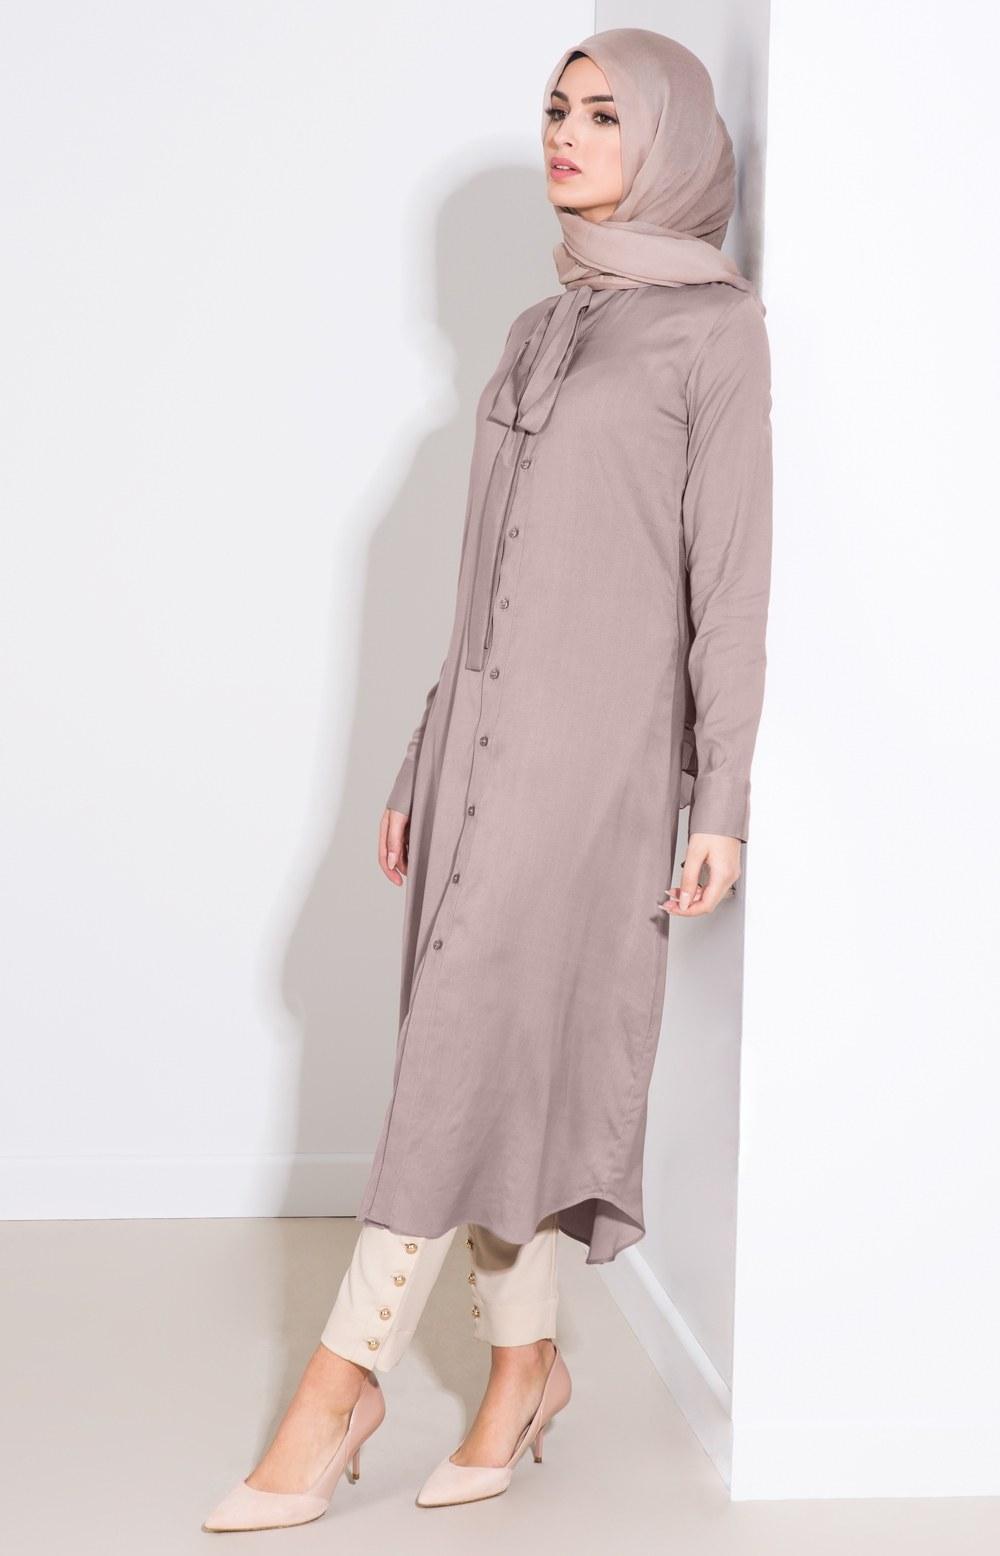 Model Model Baju Lebaran Terbaru Wanita Dwdk 25 Trend Model Baju Muslim Lebaran 2018 Simple & Modis